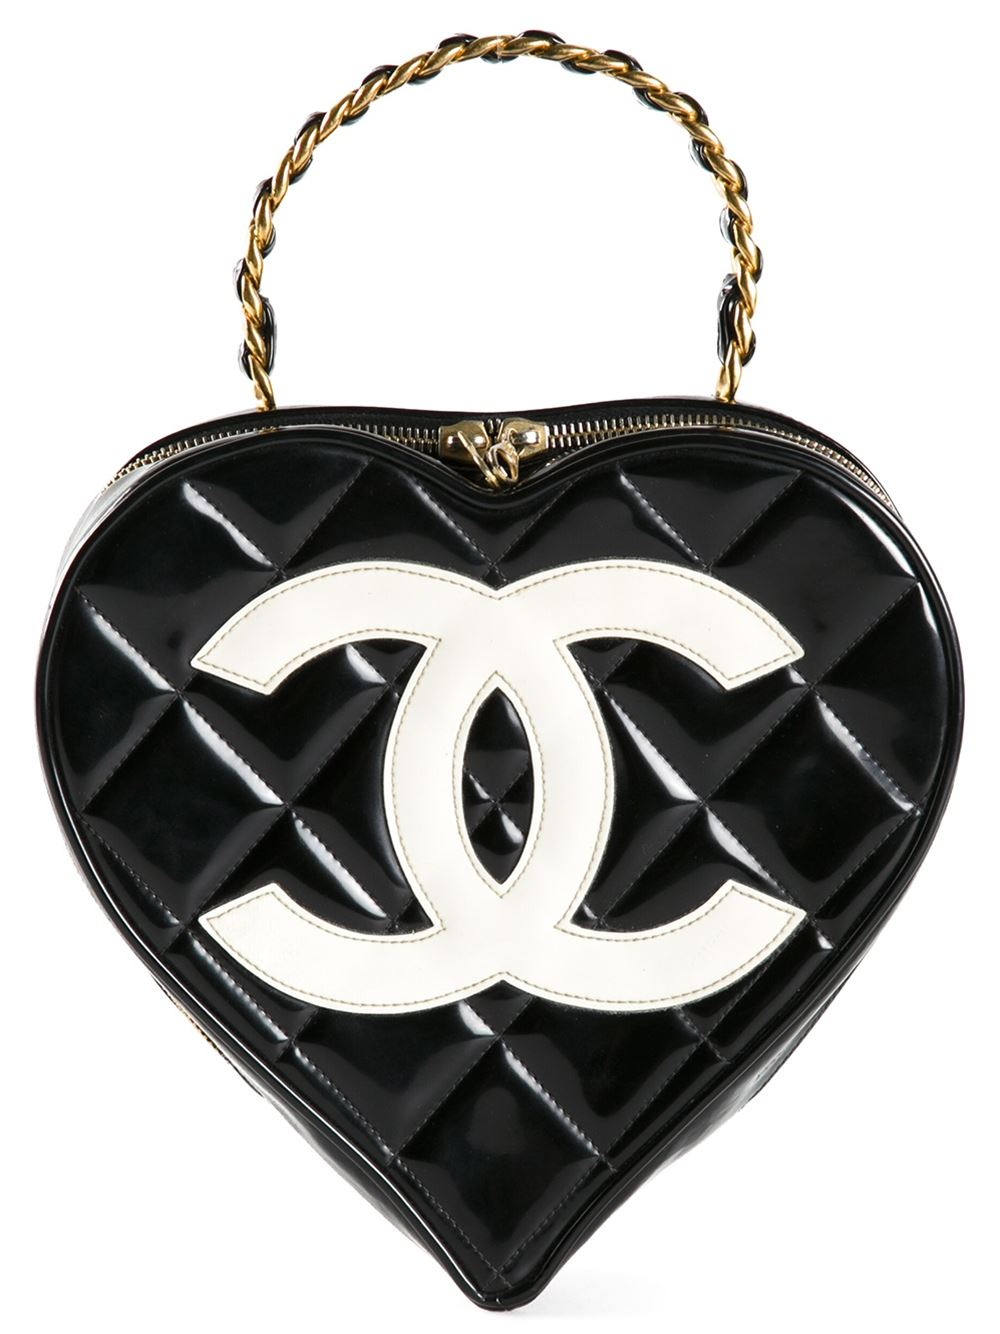 Splurge du Jour  Chanel Vintage Heart Shaped Tote b22fdd865d904